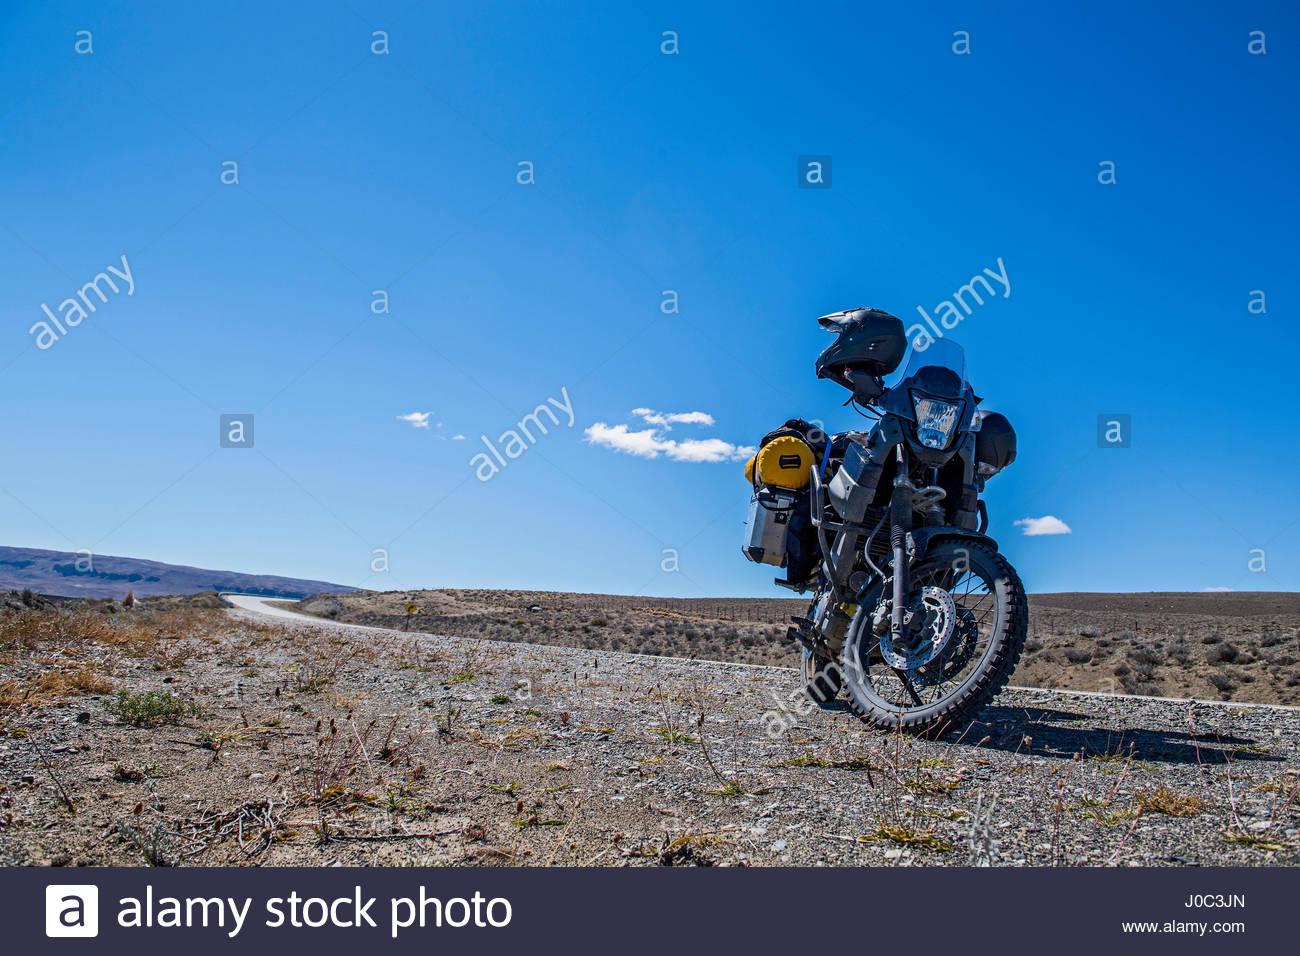 Touring motorbike parked aside 'Route 40', El Chalten, Route 40, Santa Cruz province, Argentina - Stock Image